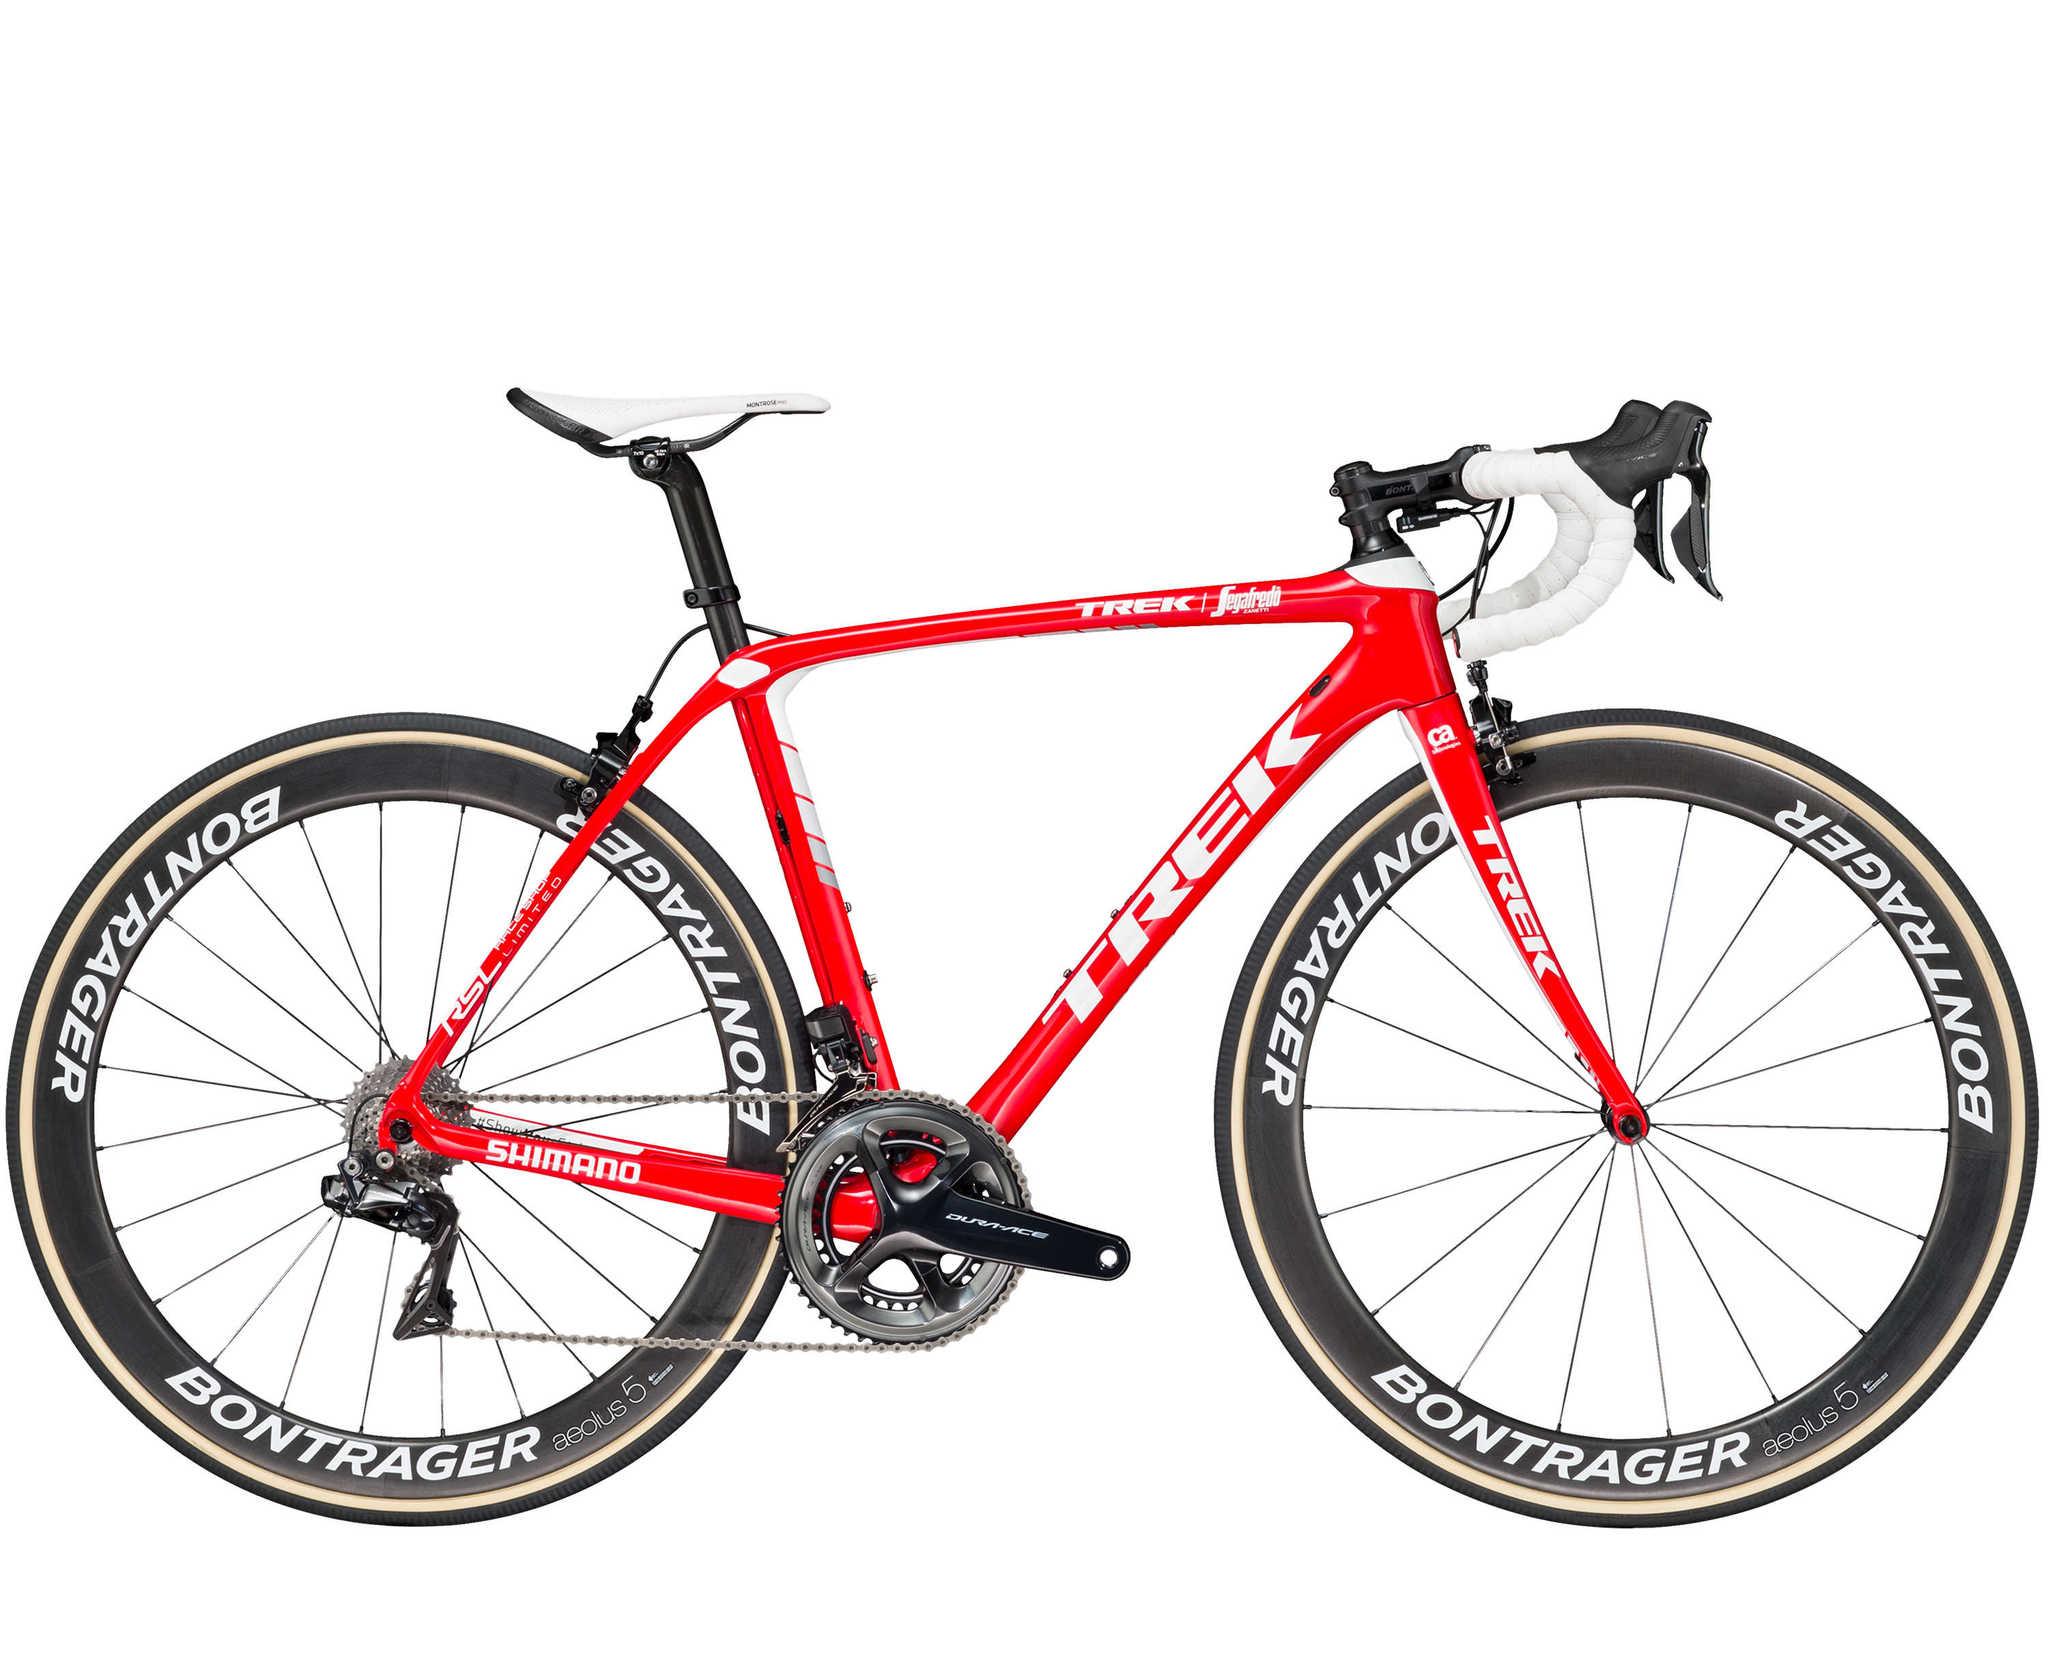 Trek Domane SLR 10 Race Shop Limited (2017)